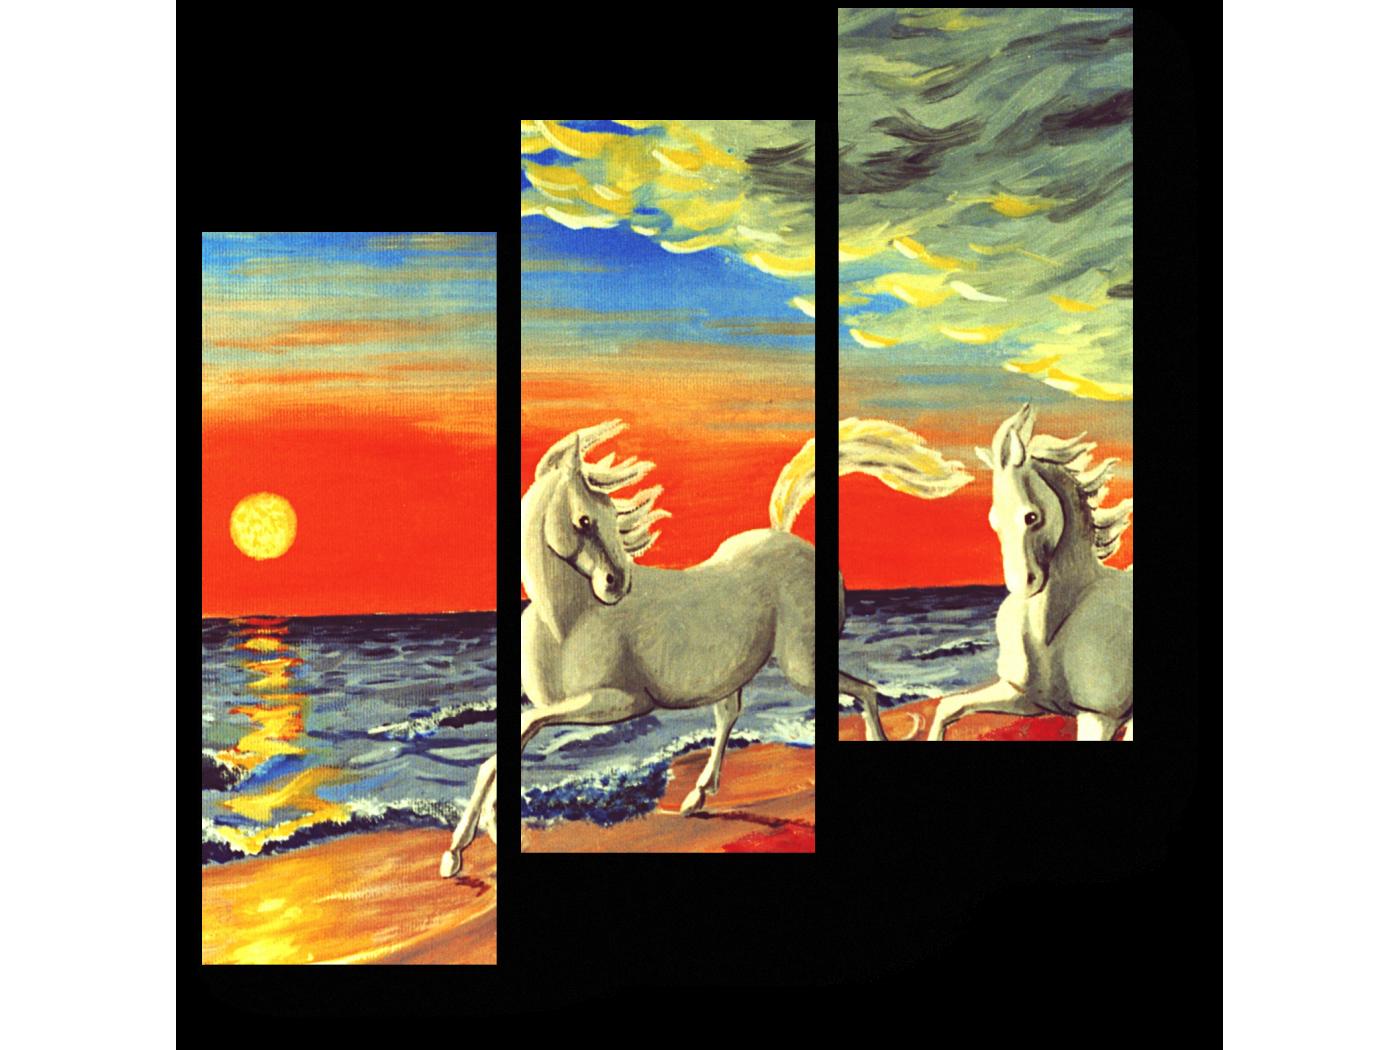 Модульная картина Бегущие по пляжу (60x64) фото